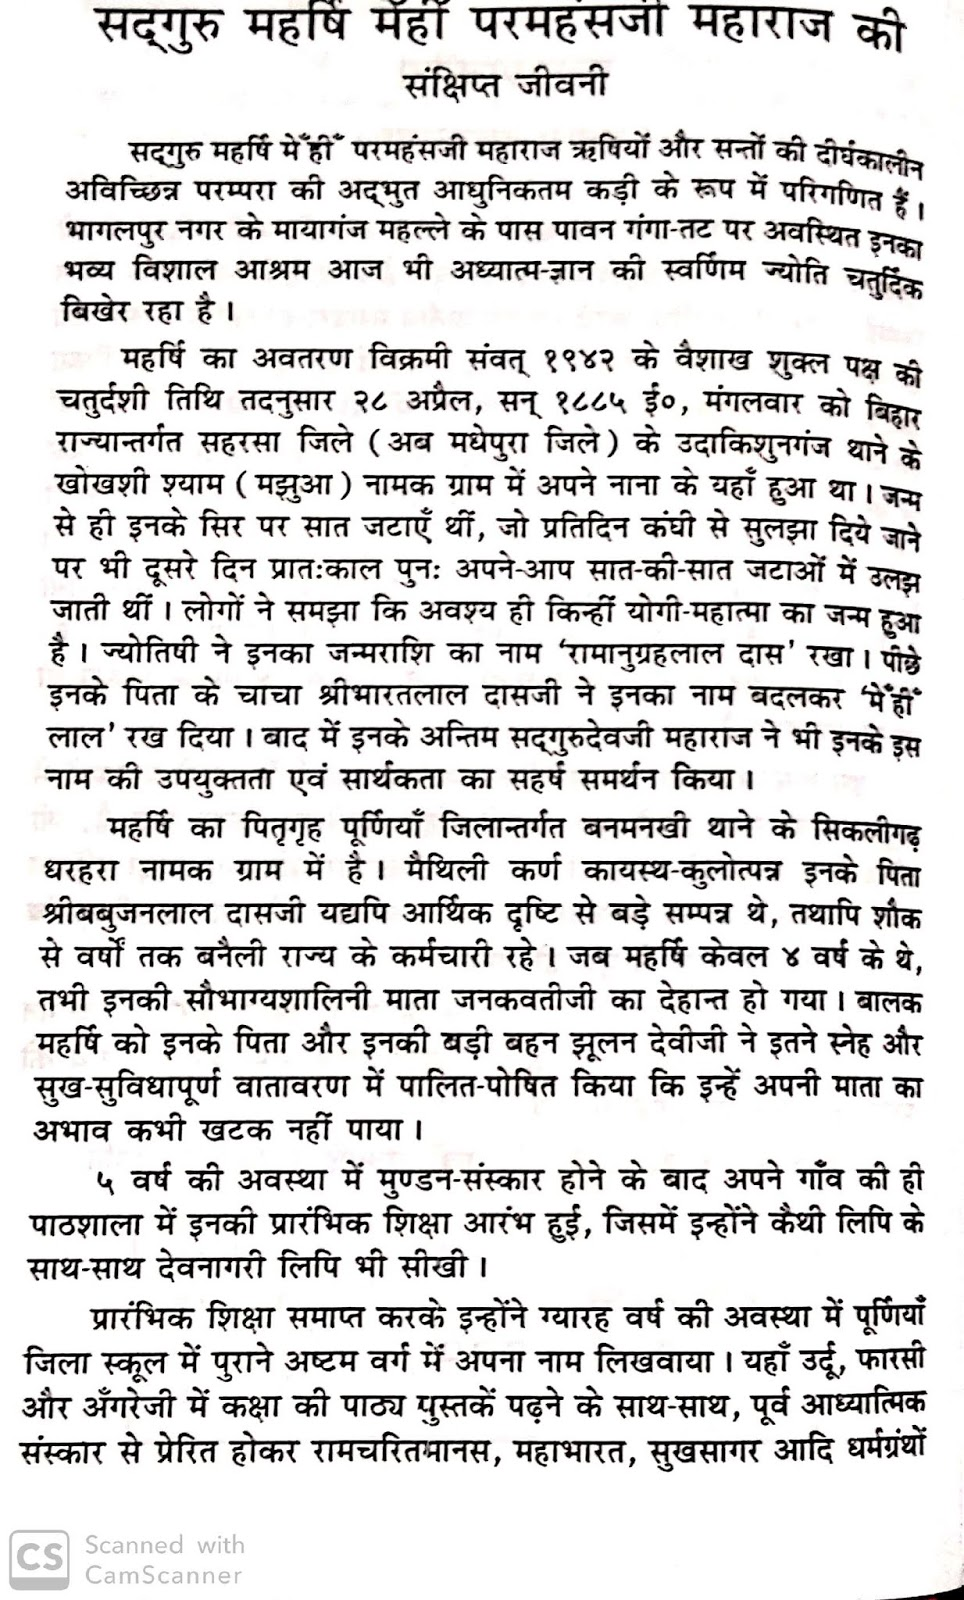 सद्गुरु महर्षि मेंहीं परमहंस जी महाराज एक परिचय Paramahansa ji is an introduction to Sadguru Maharshi। महर्षि मेंही परिचय चित्र 1